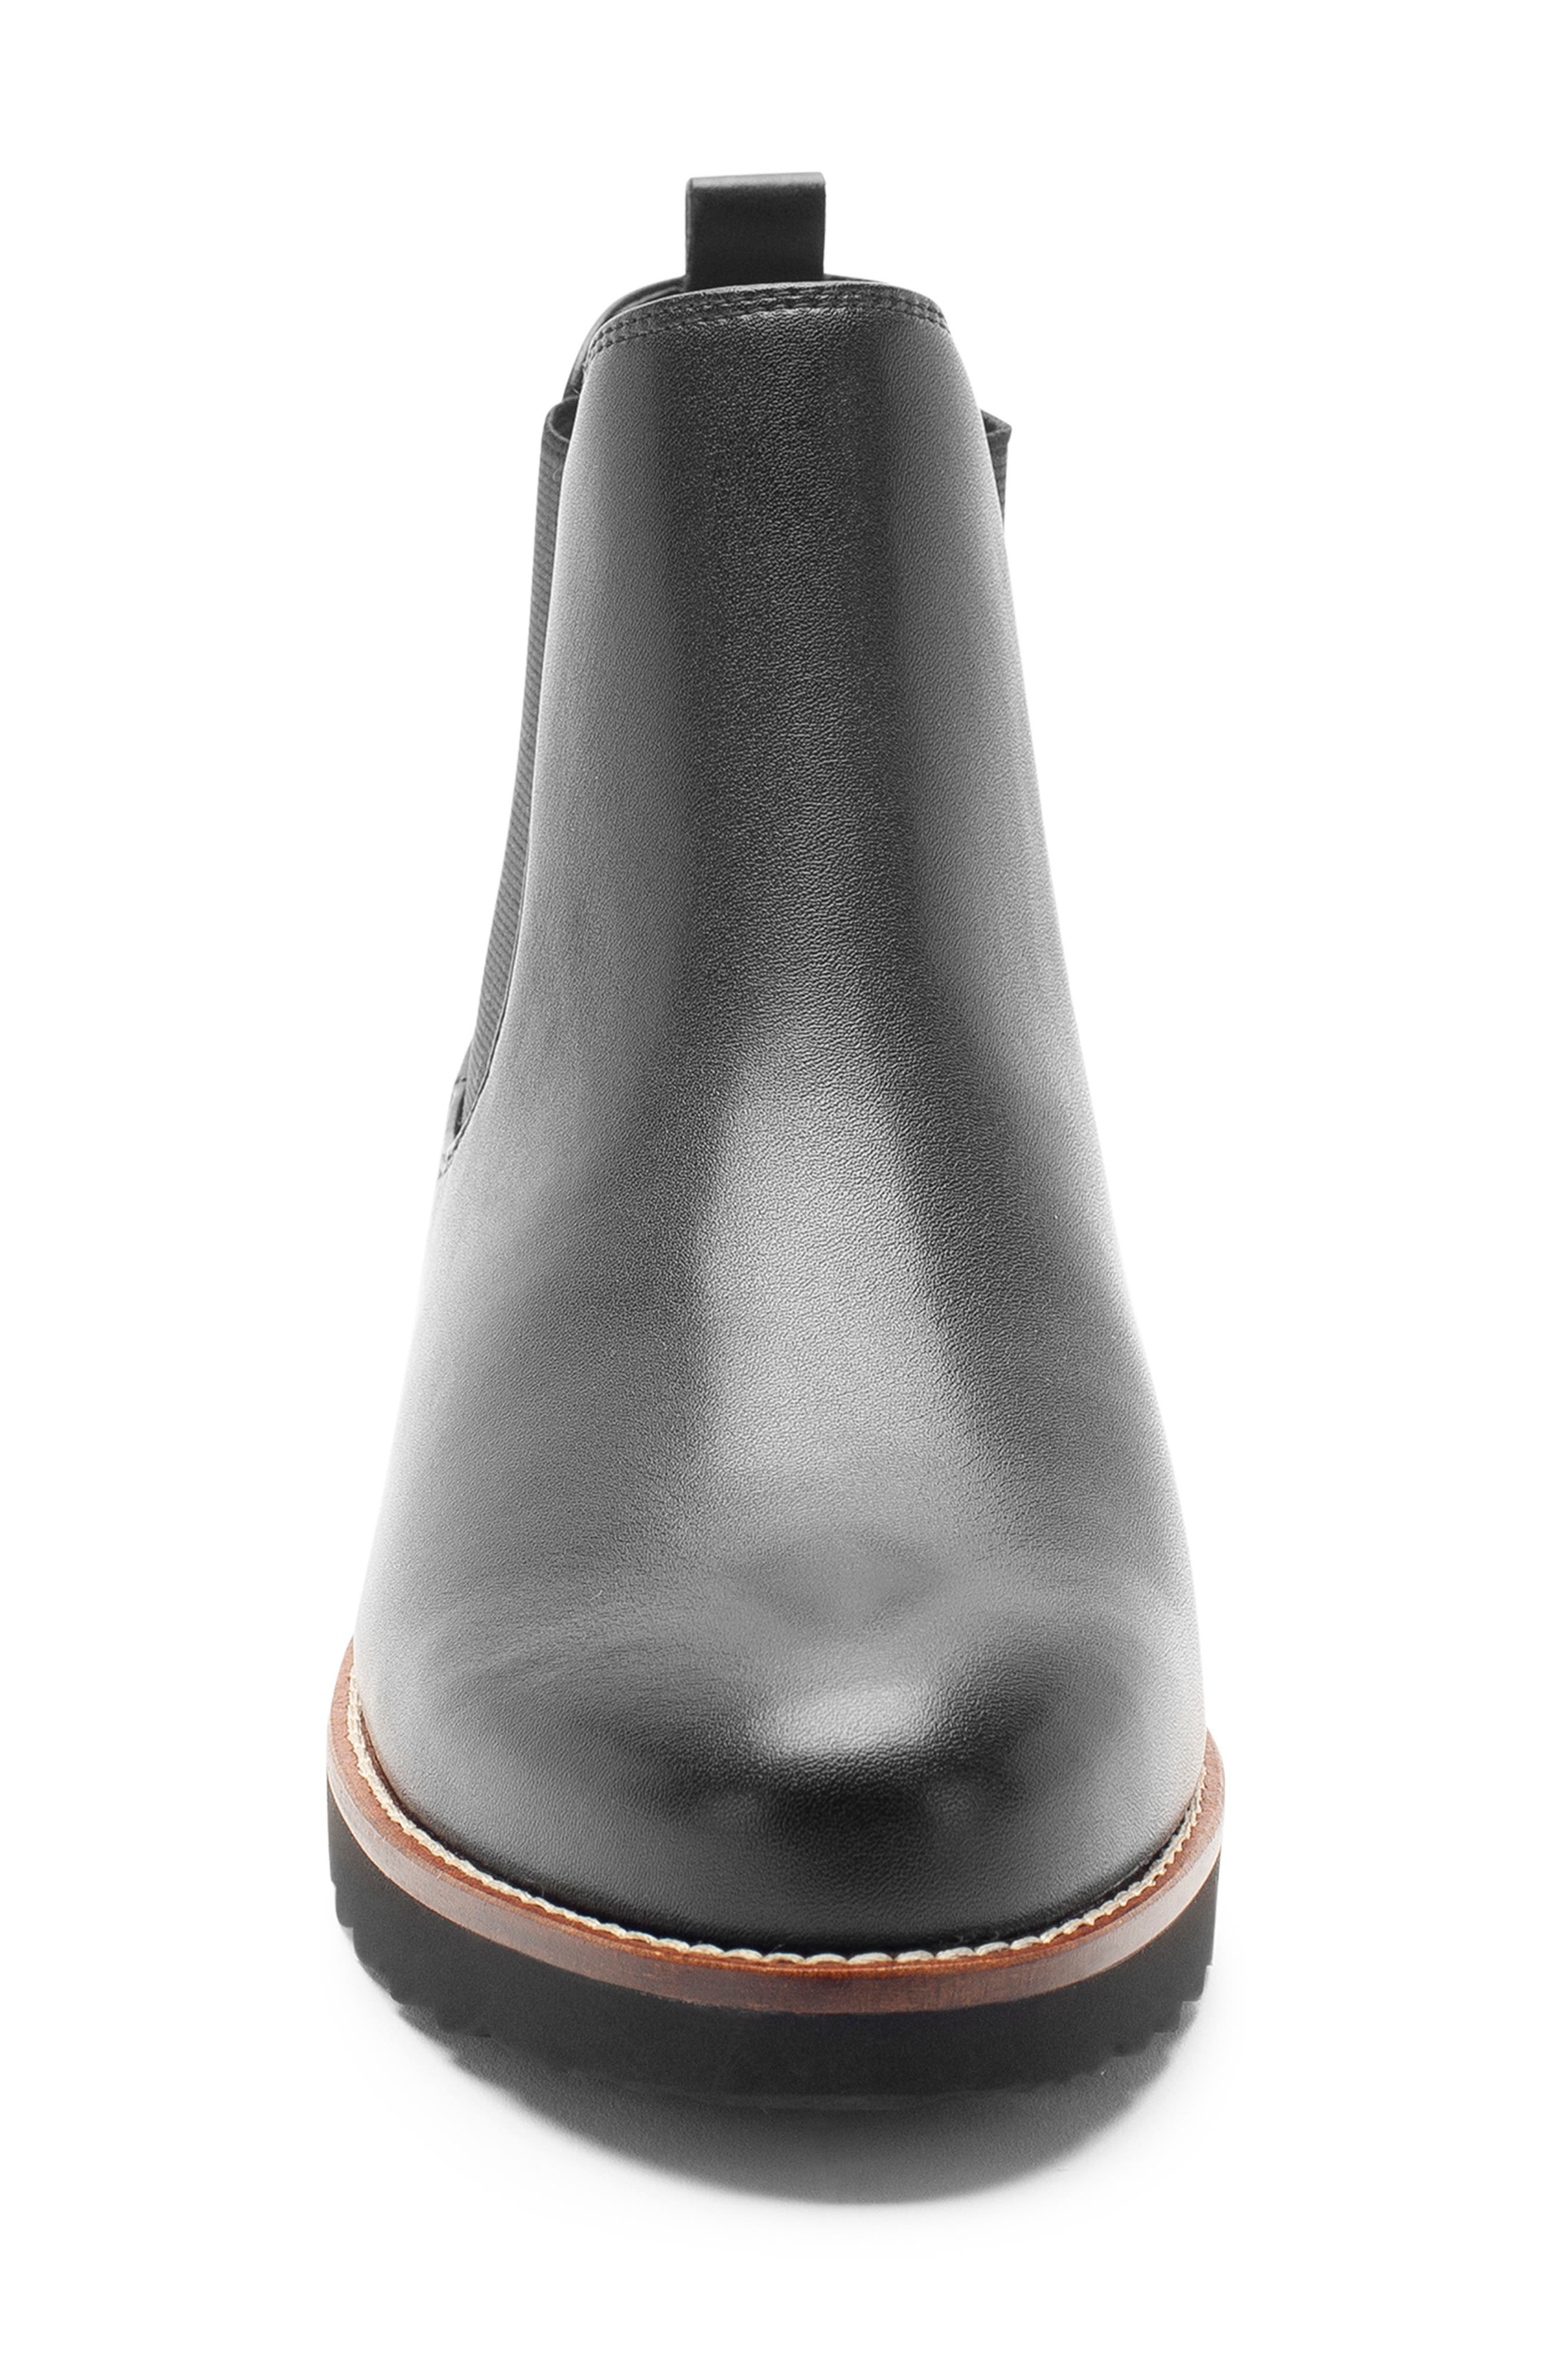 Roman Waterproof Bootie,                             Alternate thumbnail 6, color,                             Black Leather